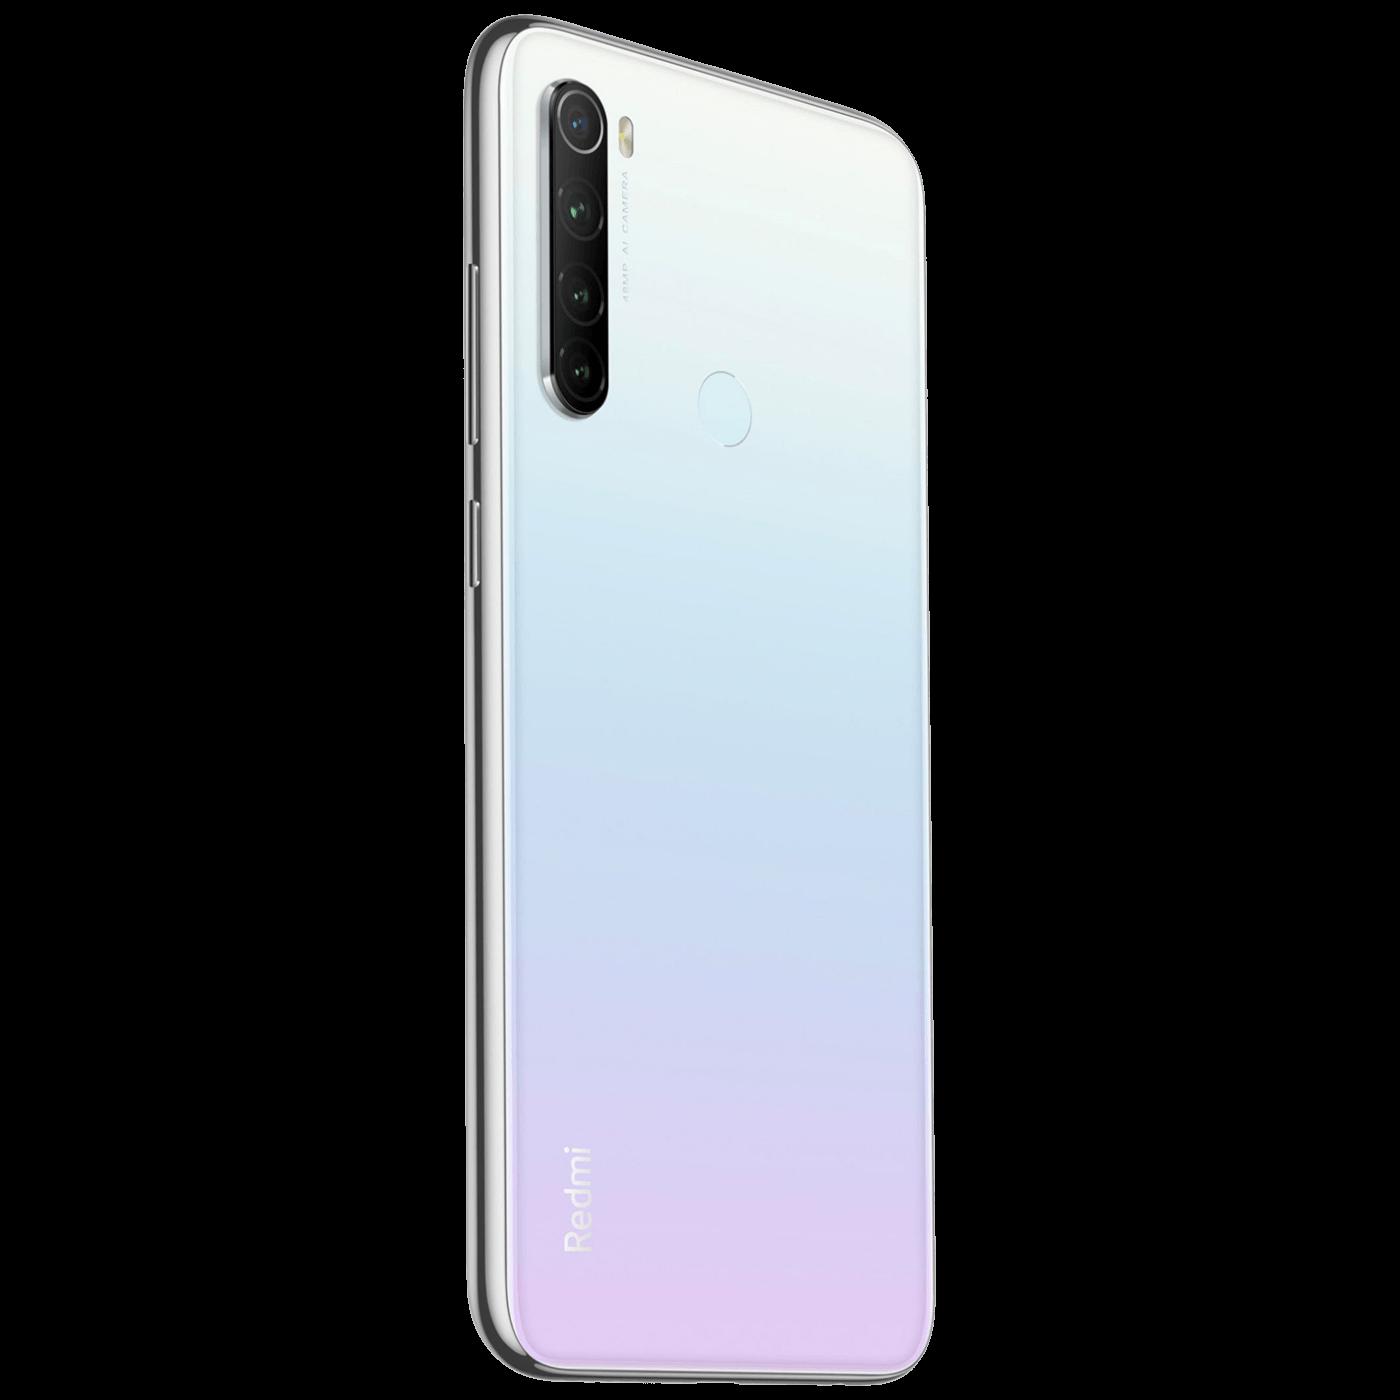 Redmi Note 8 3/32GB Moonlight White